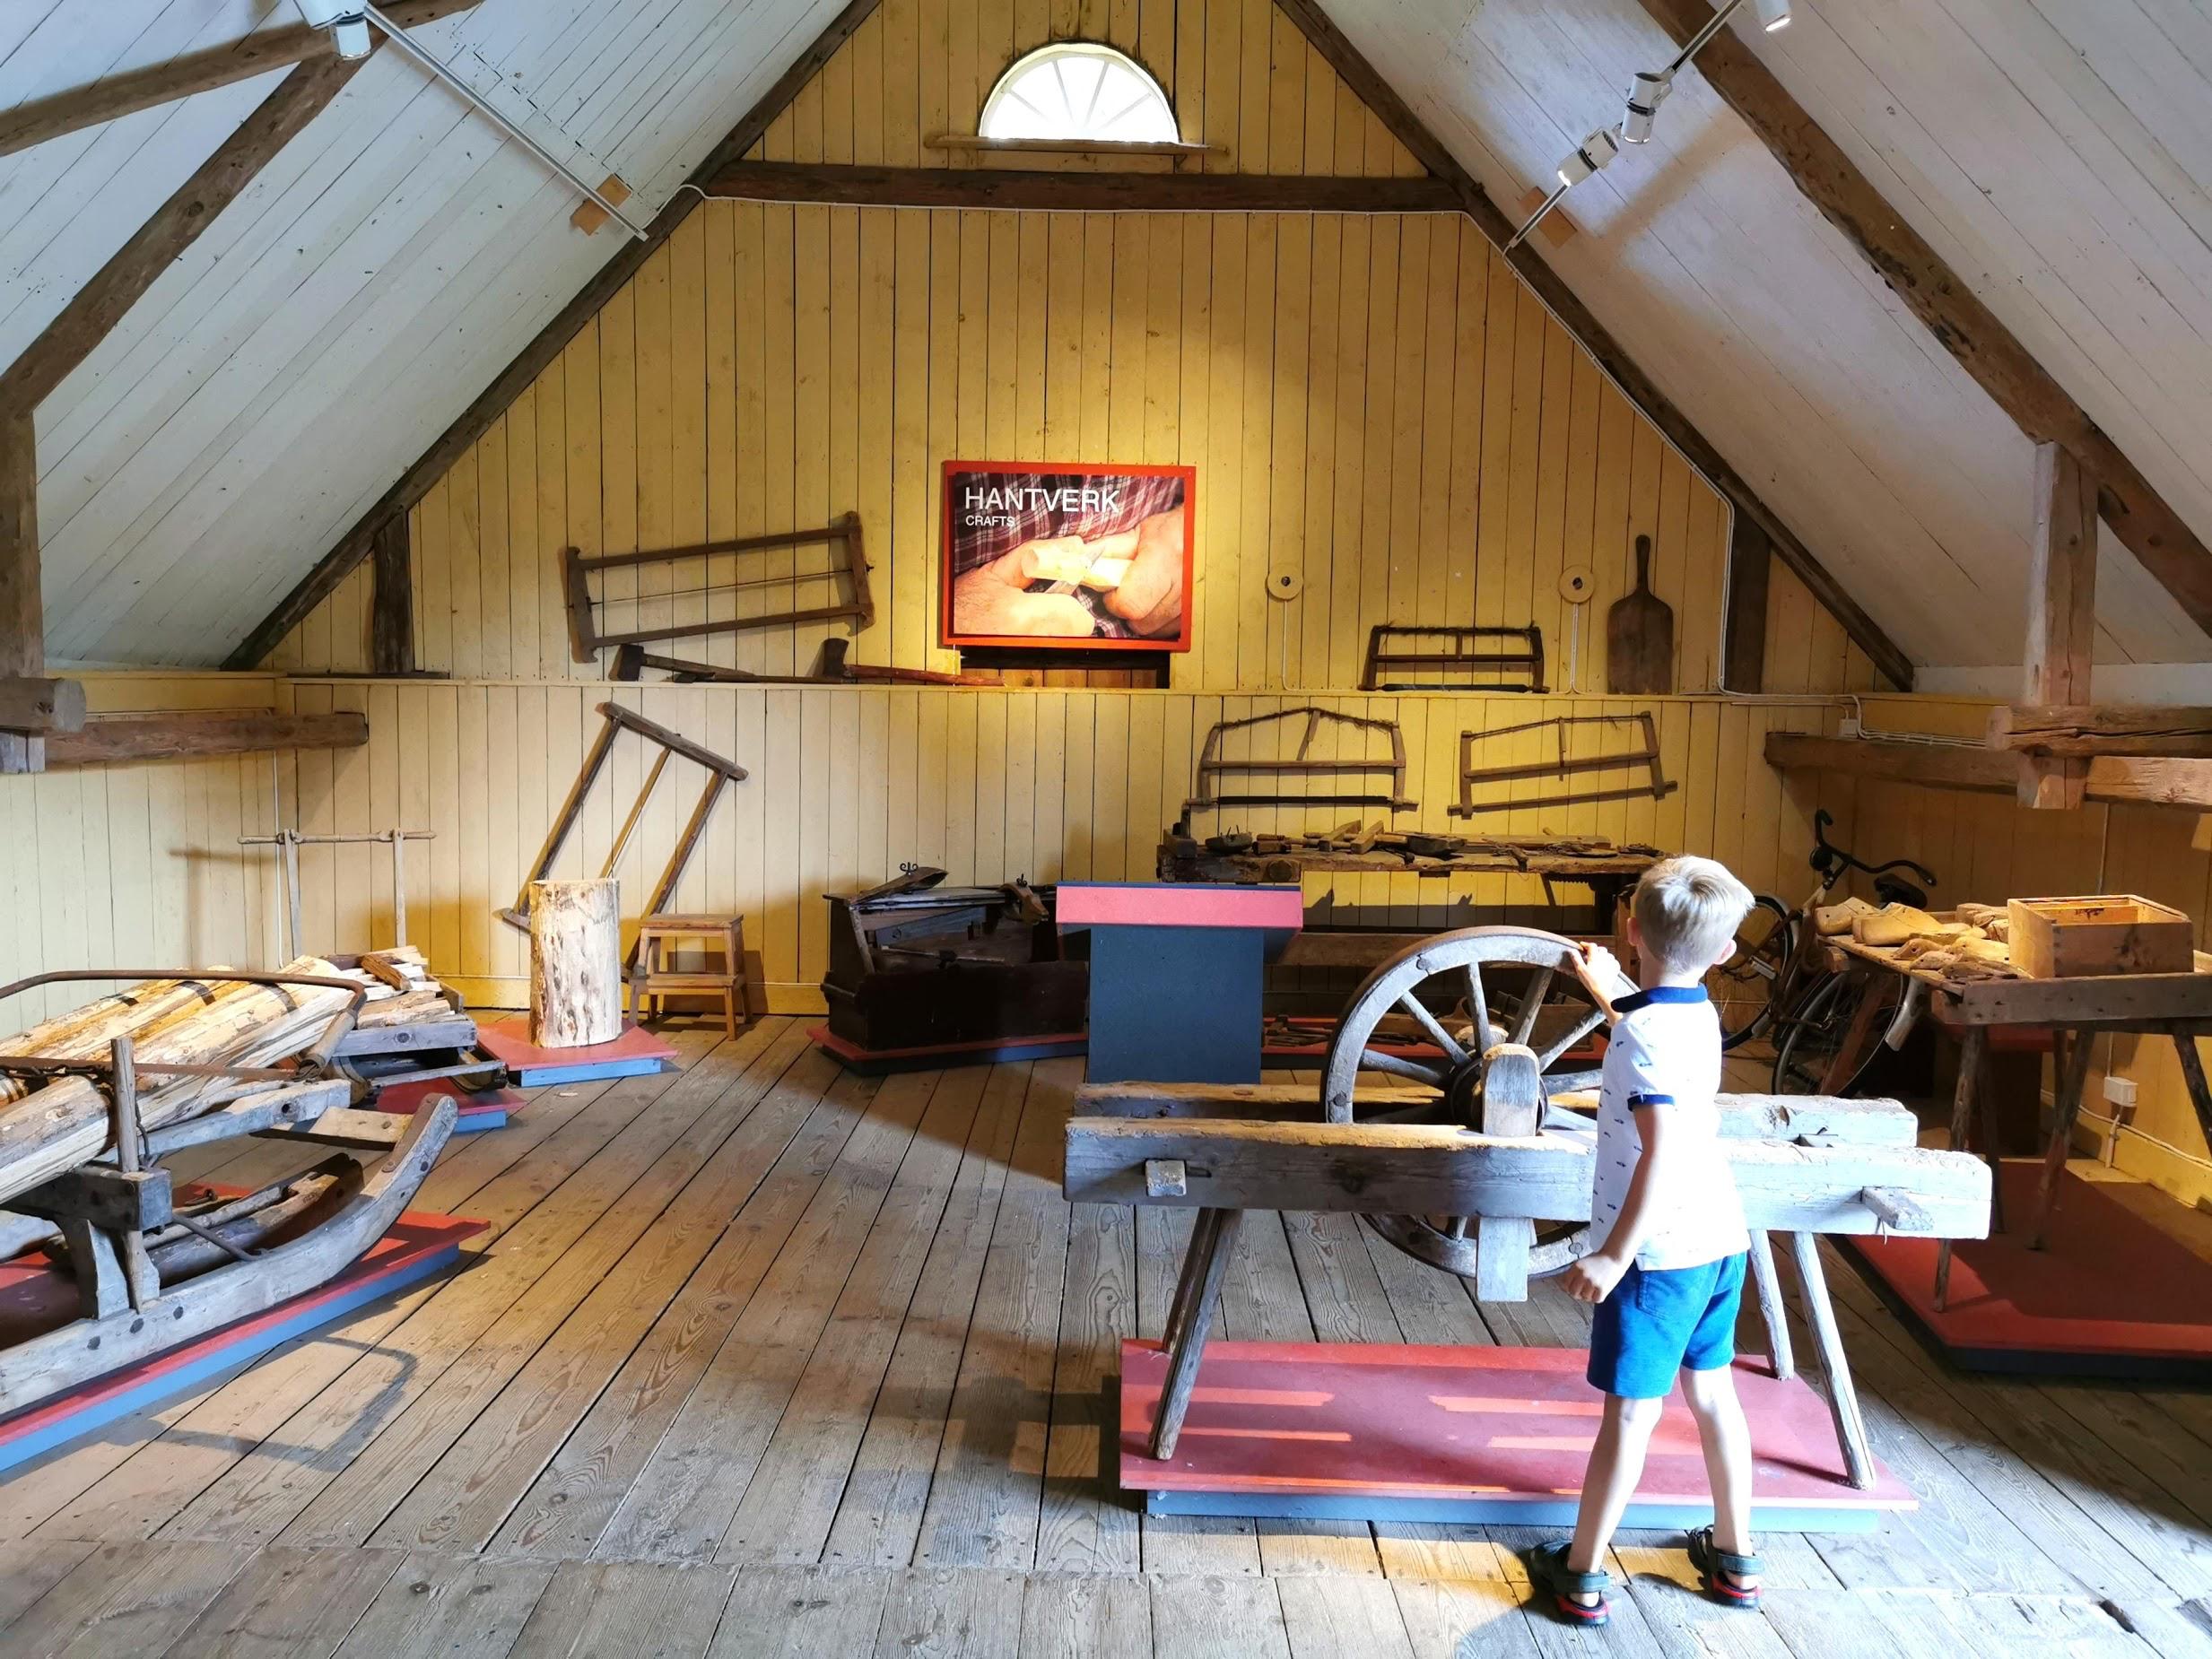 Åsens by museum